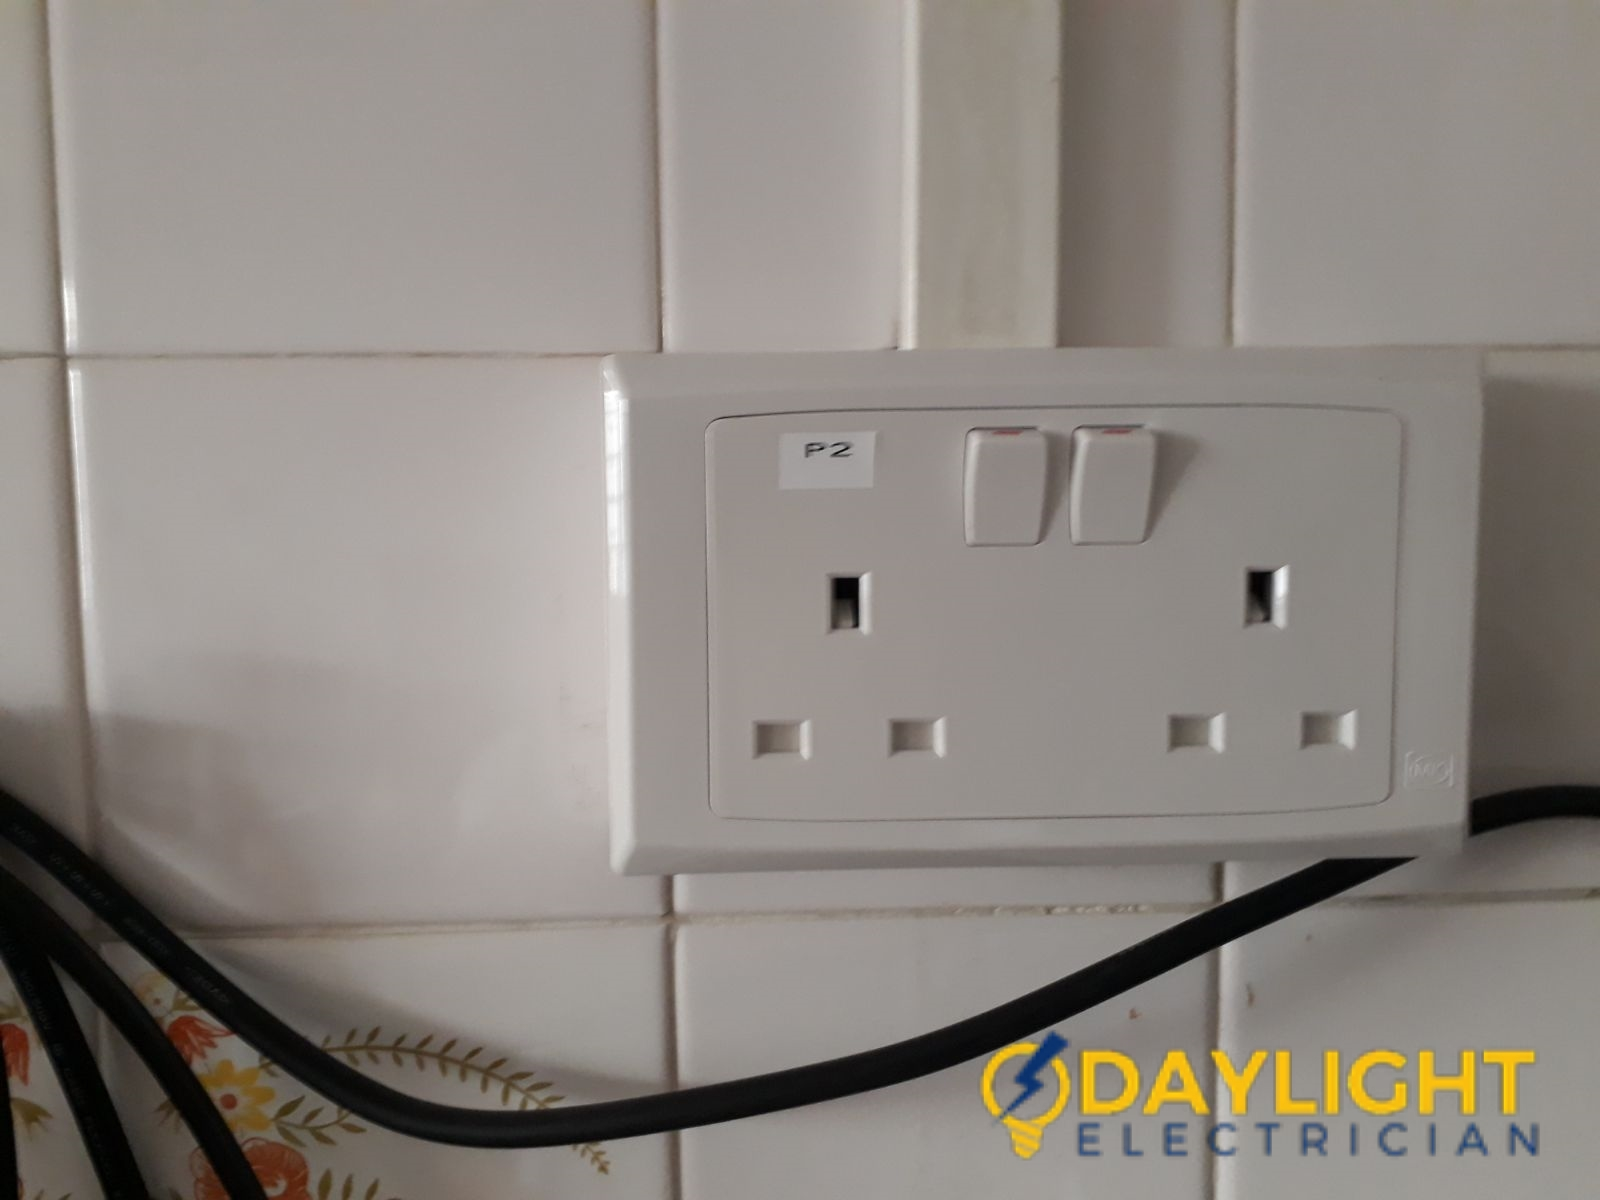 Power-Socket-Casing-Replacement-Electrician-Singapore-HDB-Jurong-East-2_wm